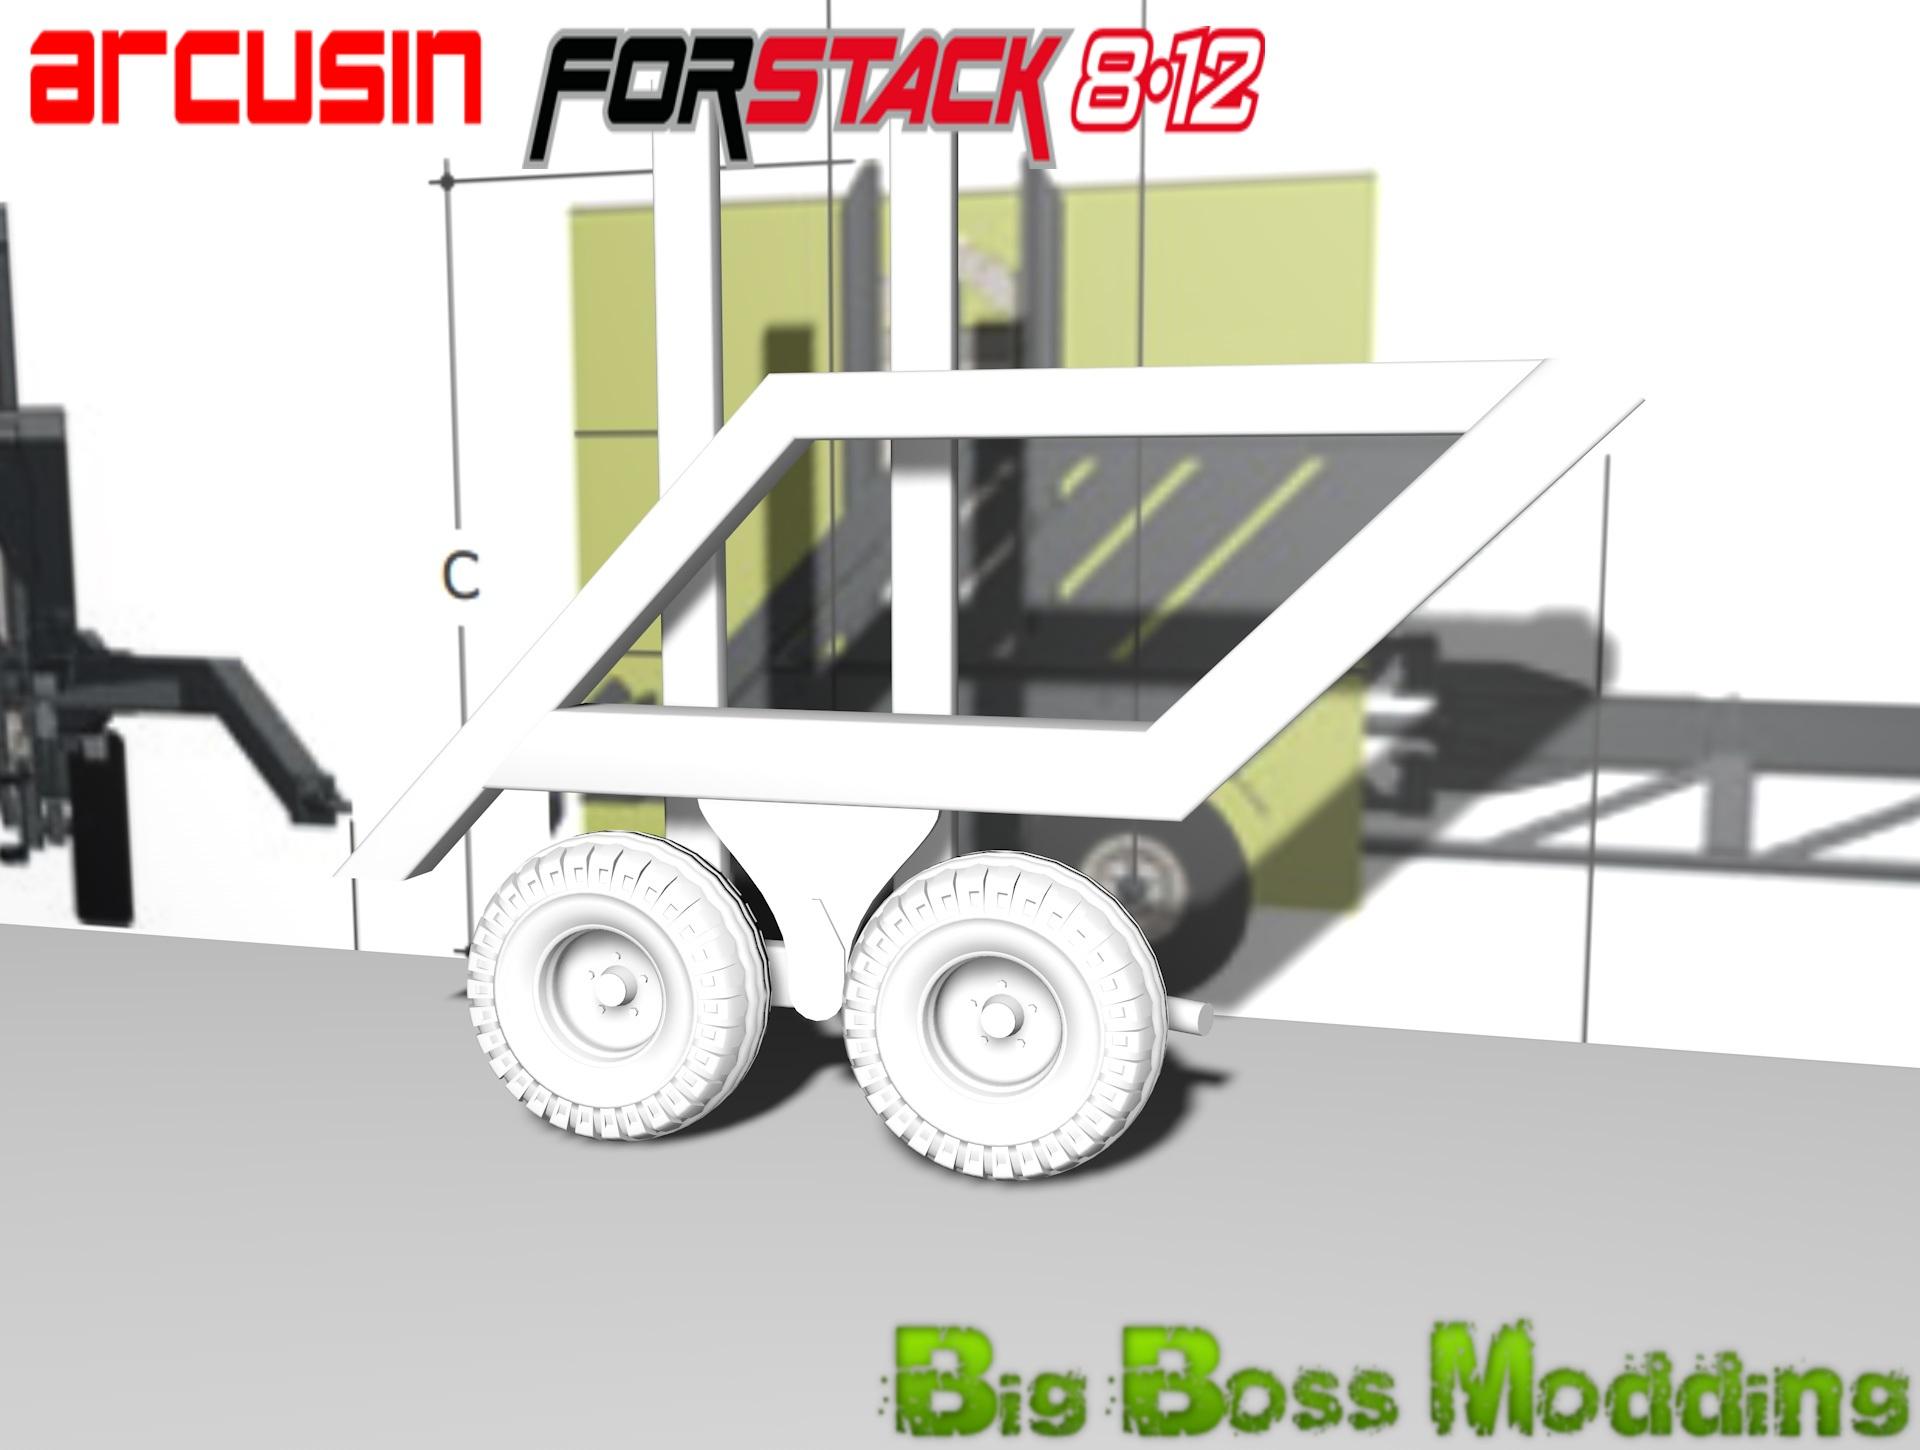 [T.E.P.] Arcusin ForStack 8-12 [Actualizado 30-5-2014] Chasis1f2bbu